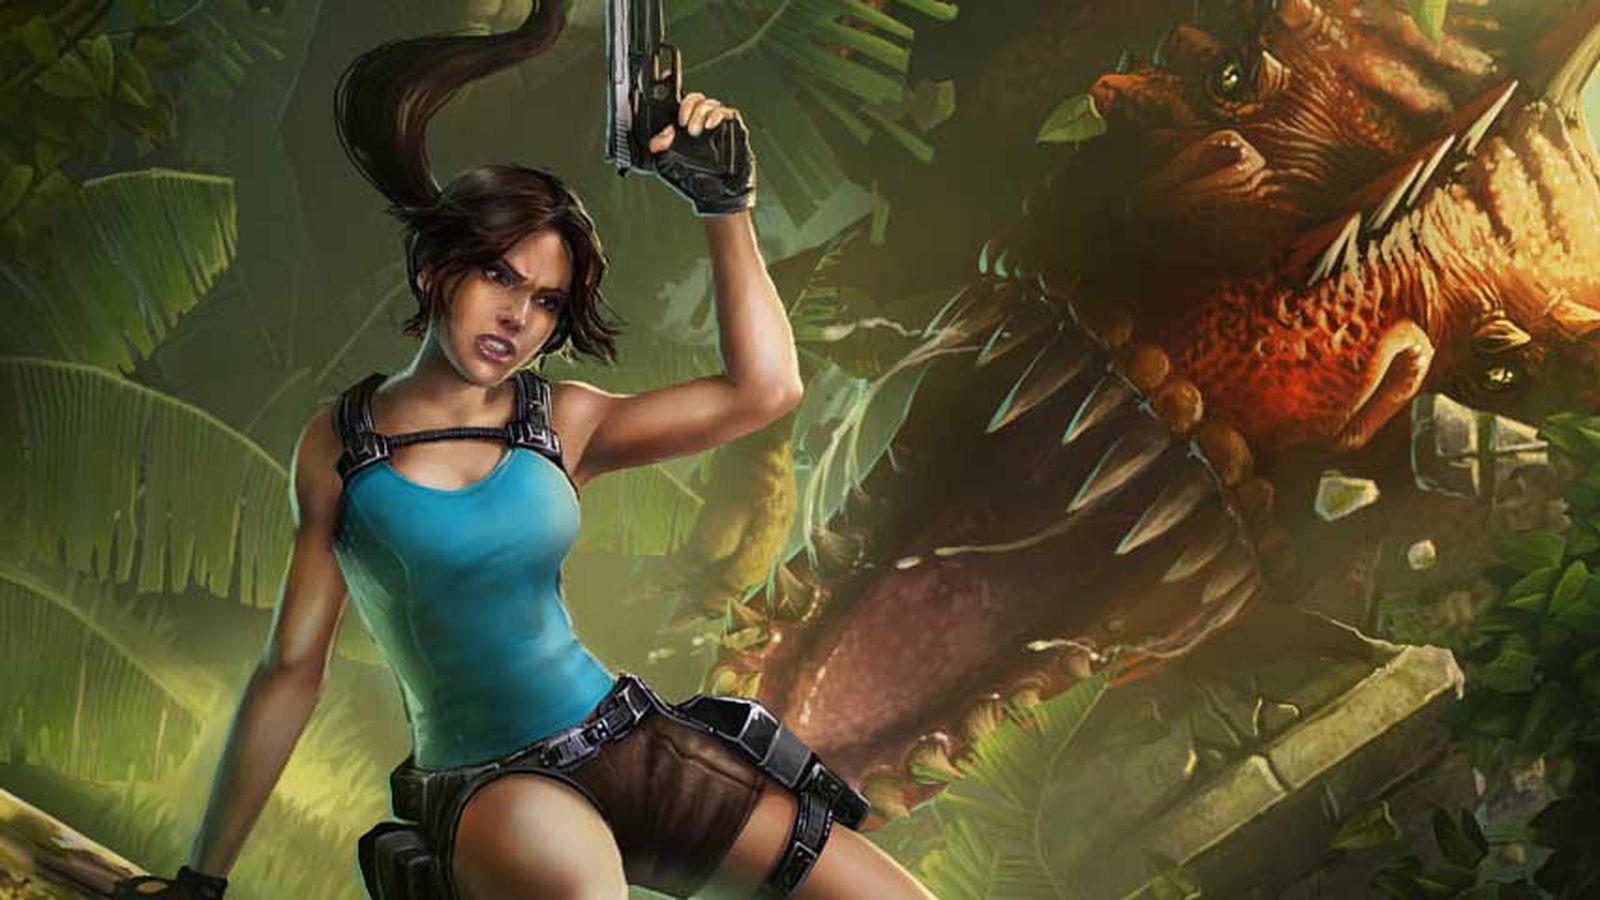 Free dowland lara croft go erotic pic